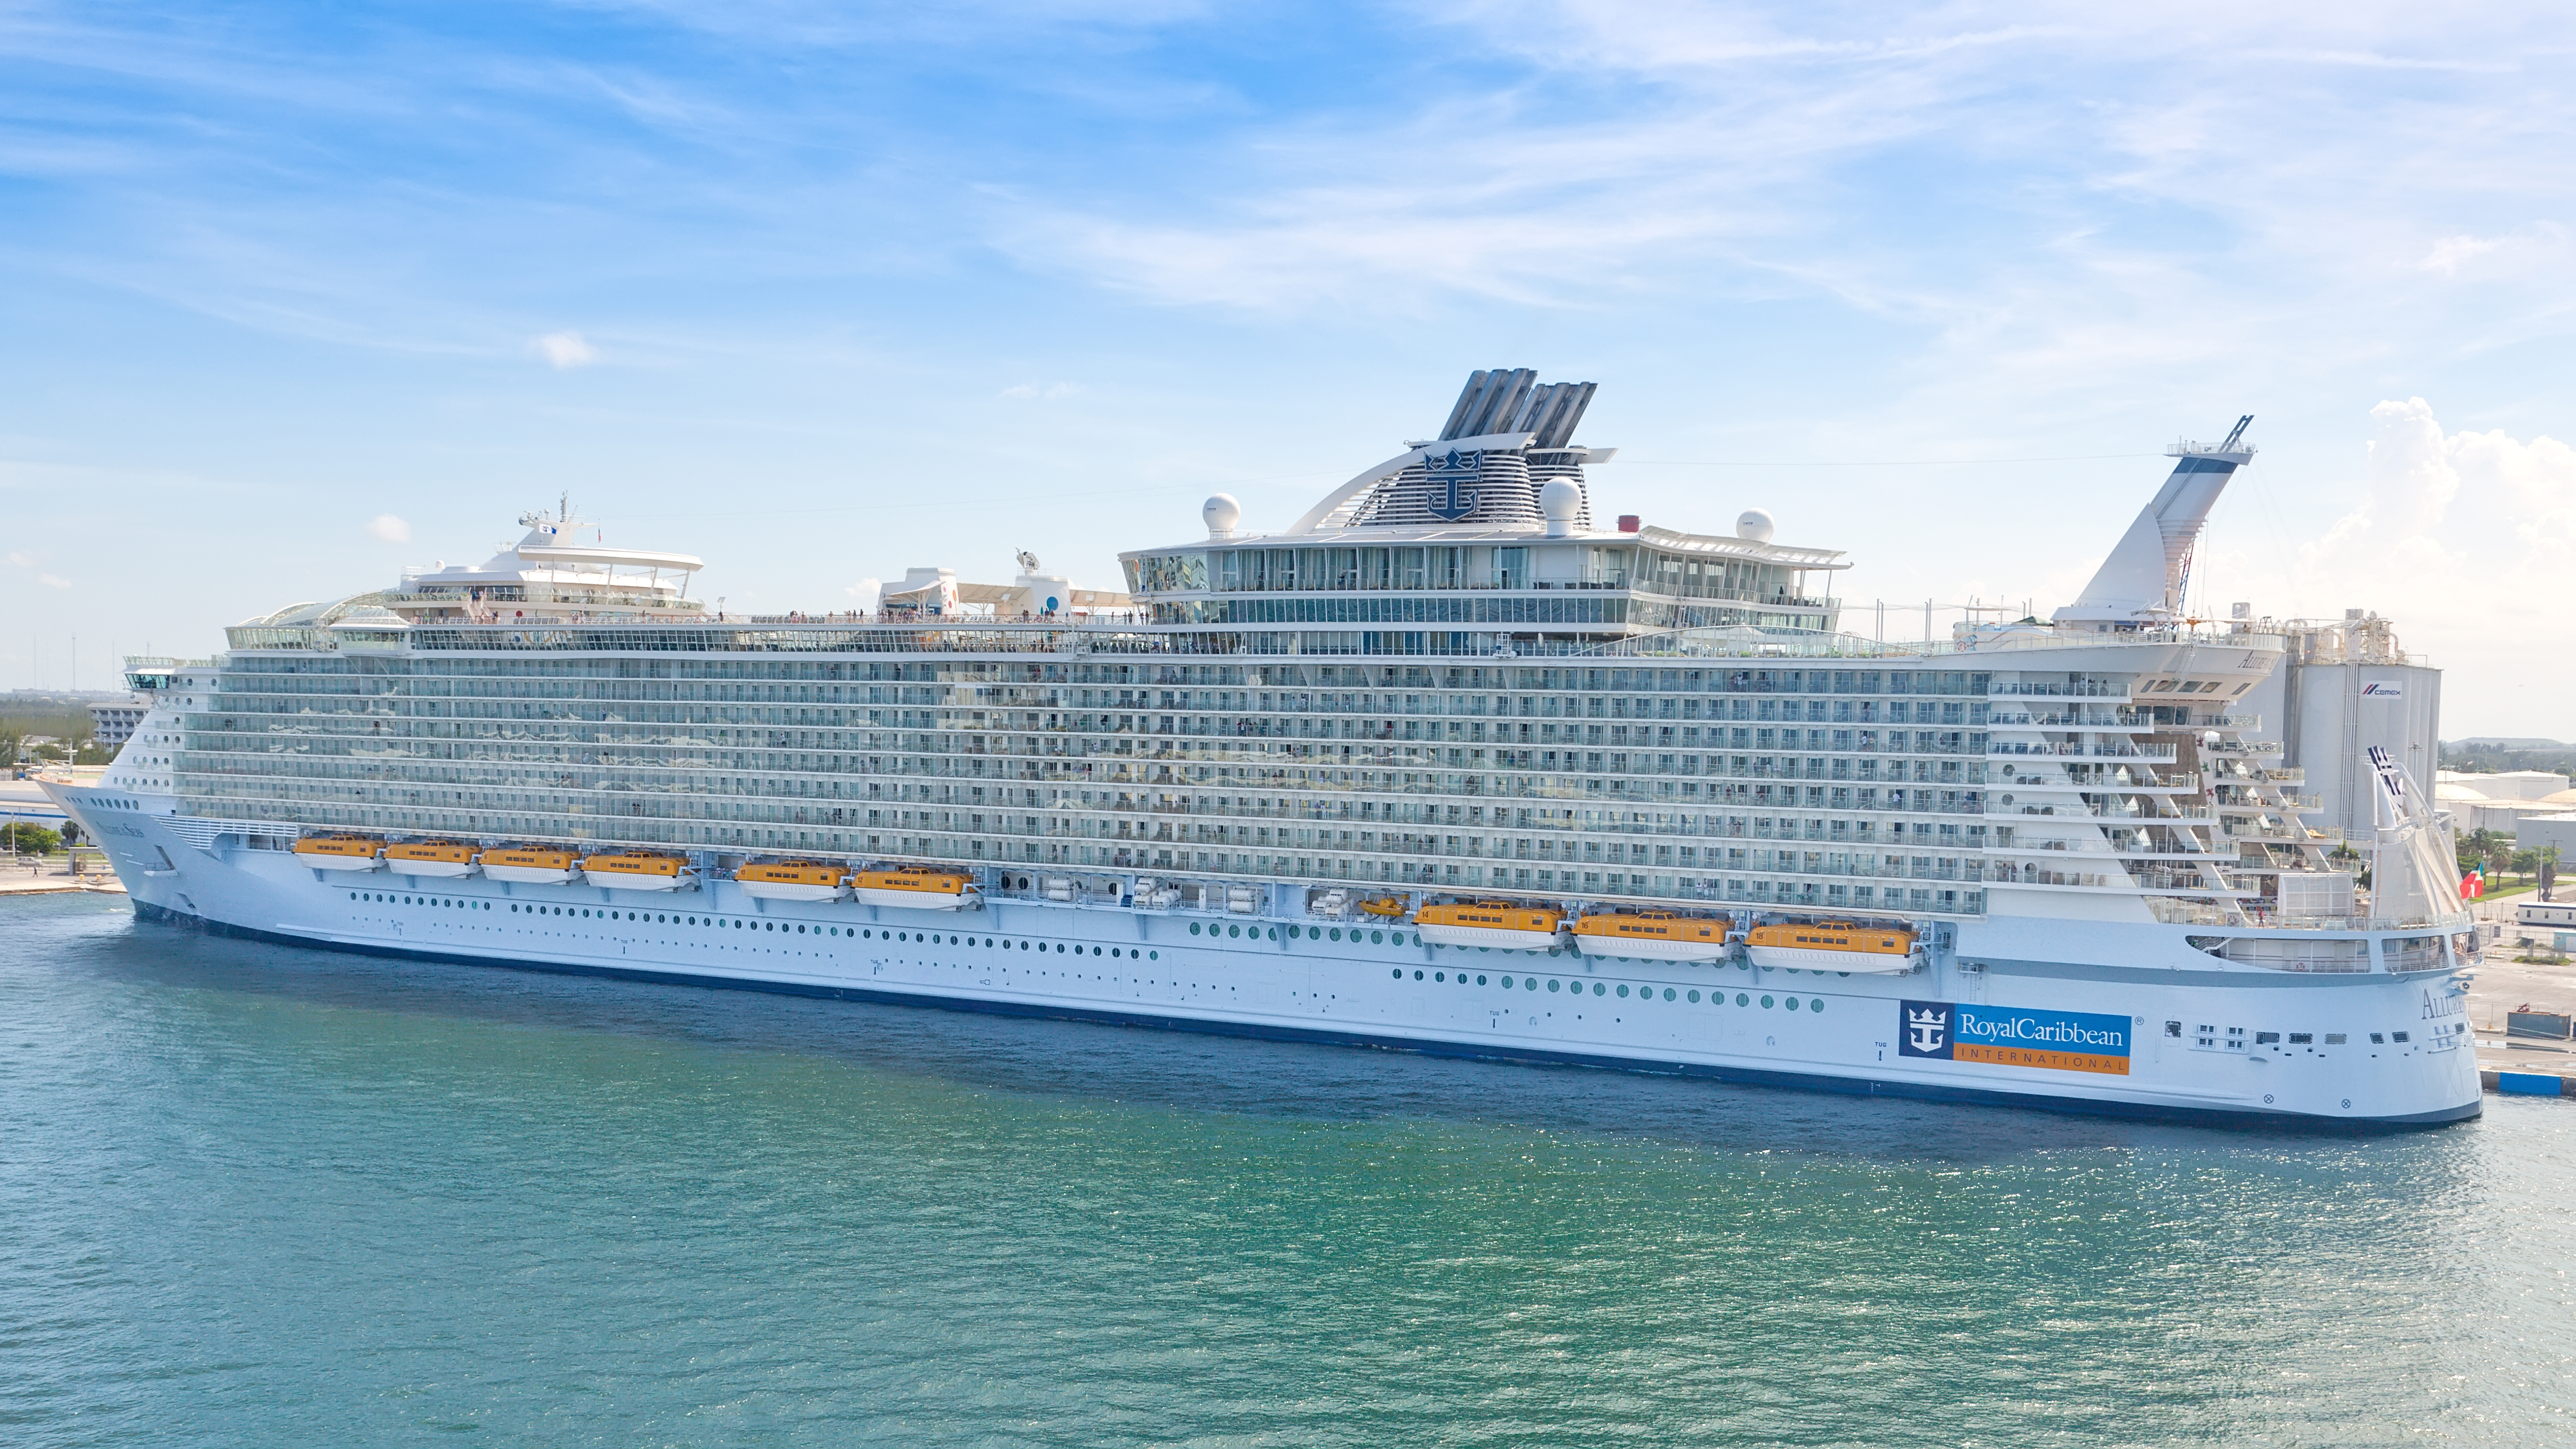 Cruceros de Royal Caribbean comenzaran a salir de puertos estadounidenses en julio